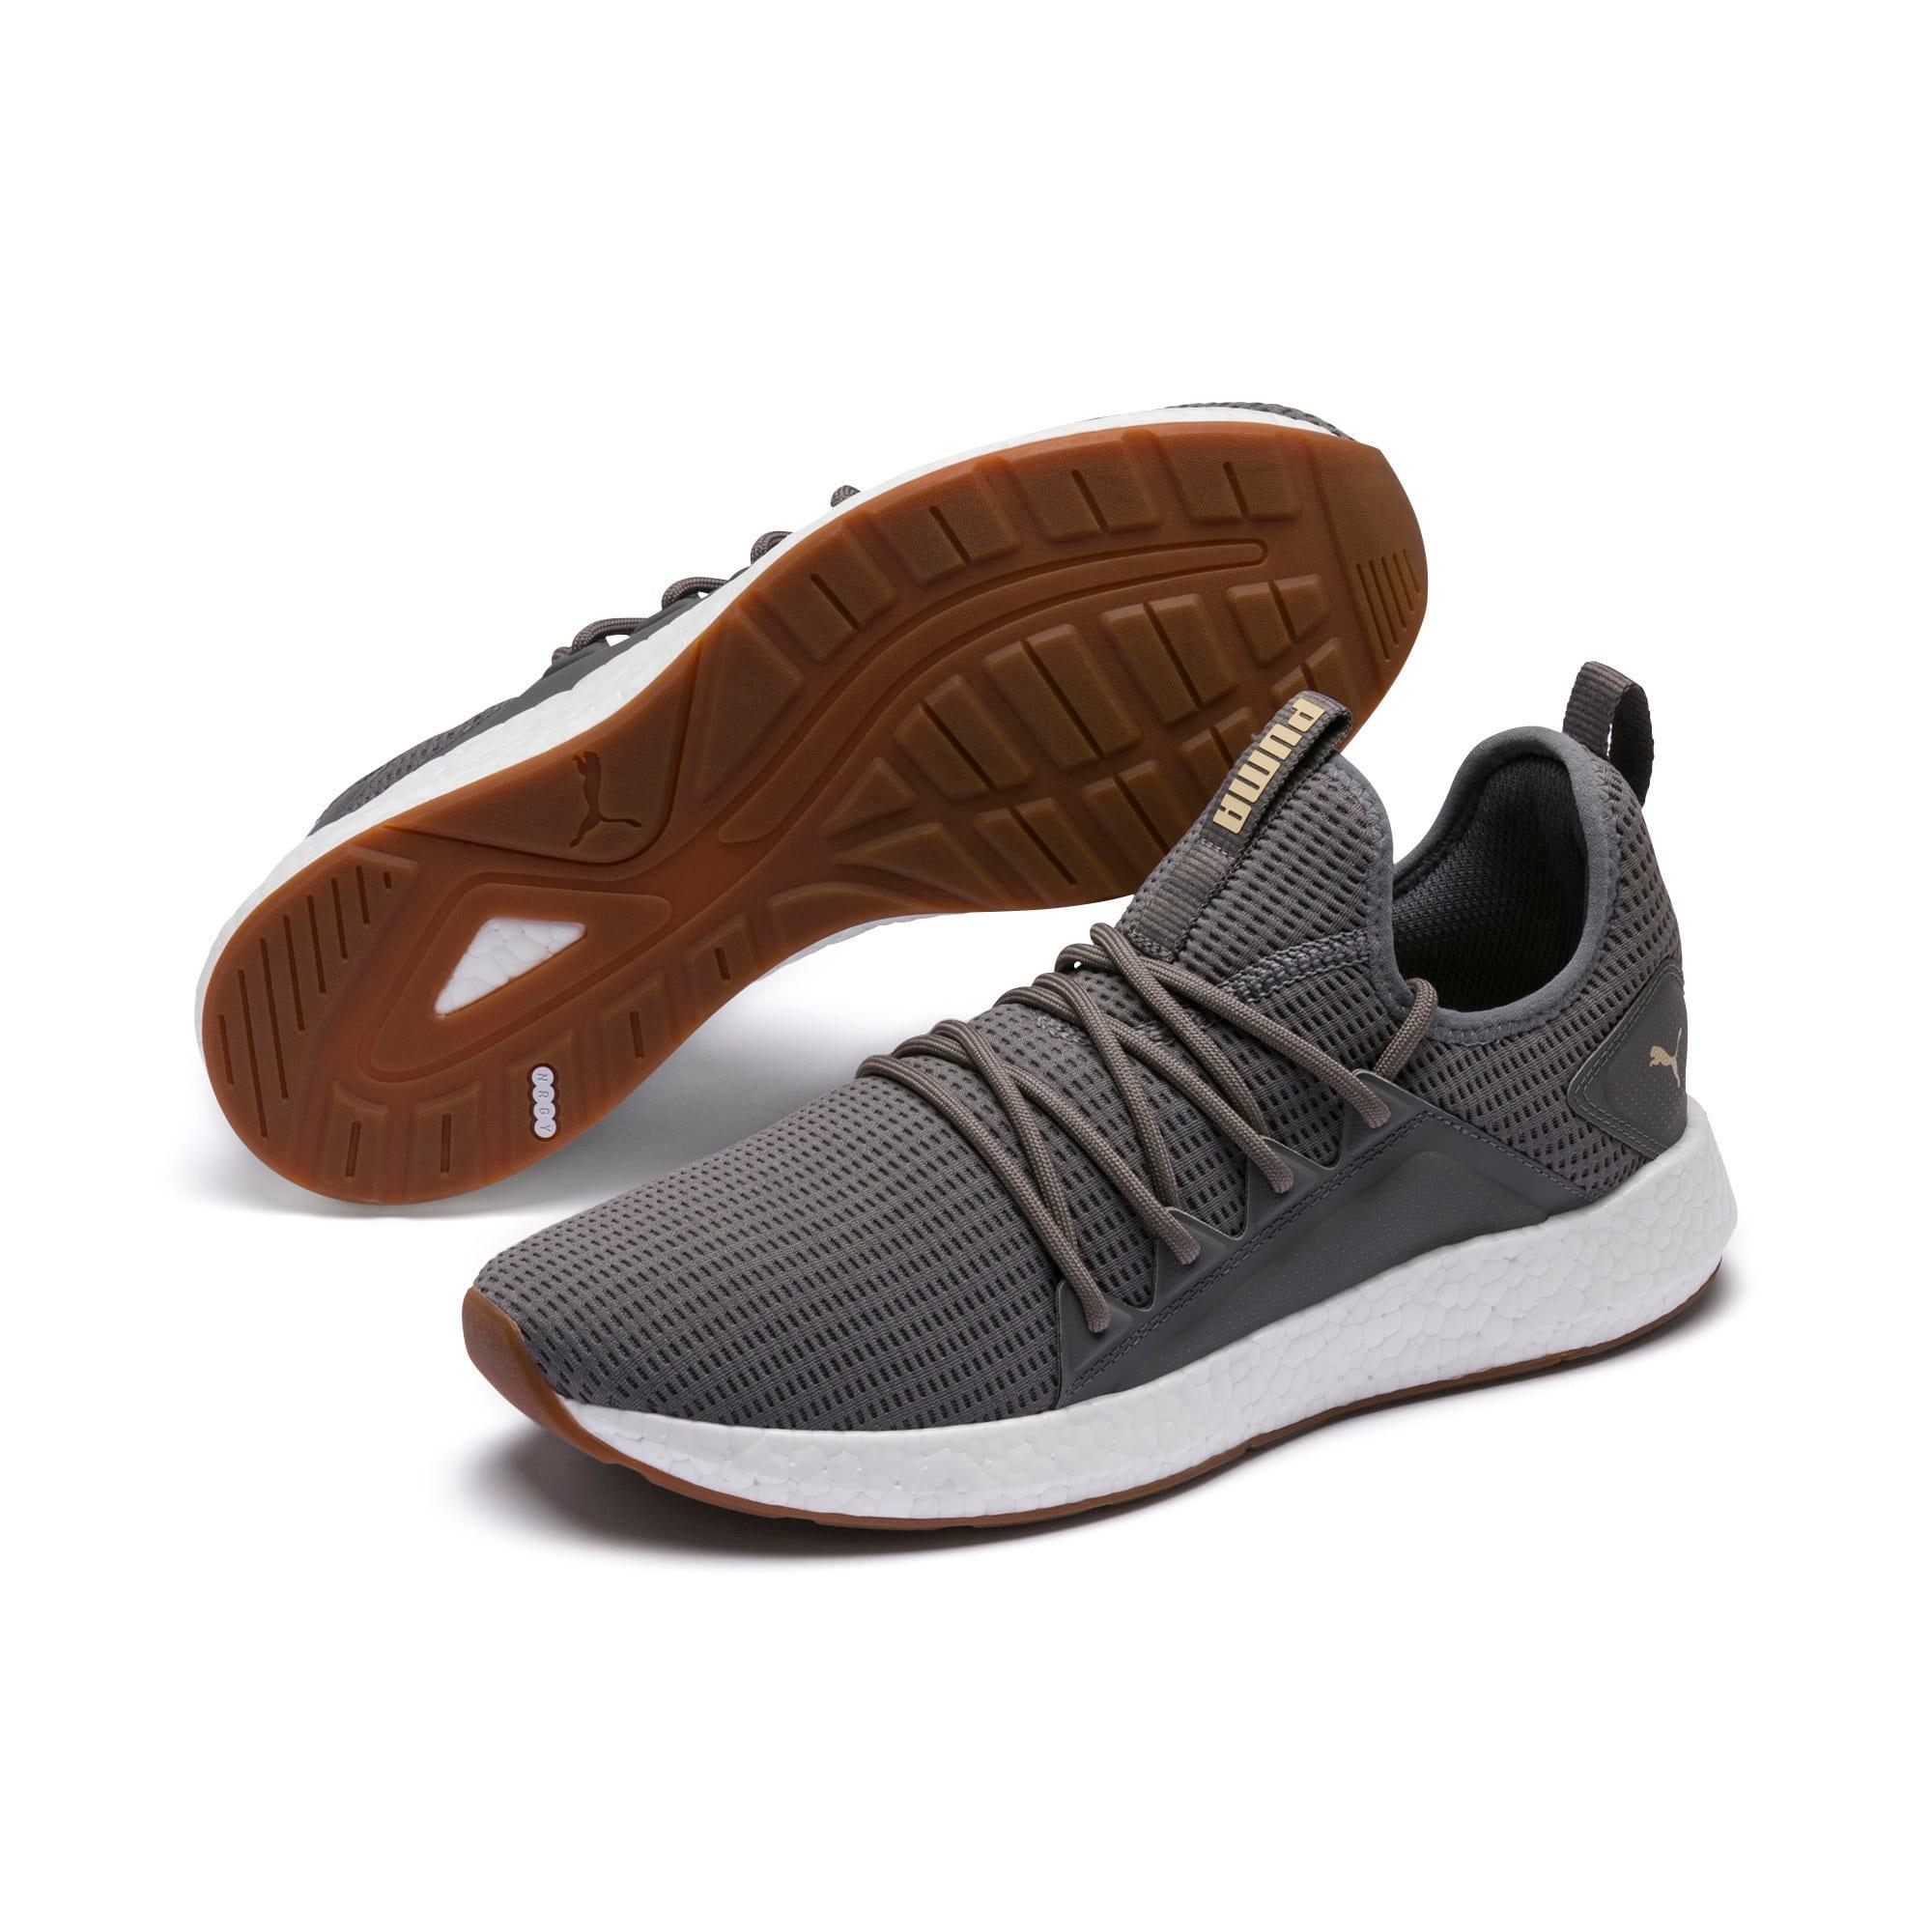 Thumbnail 2 of NRGY Neko Future Men's Running Shoes, Charcoal Gray-Taos Taupe, medium